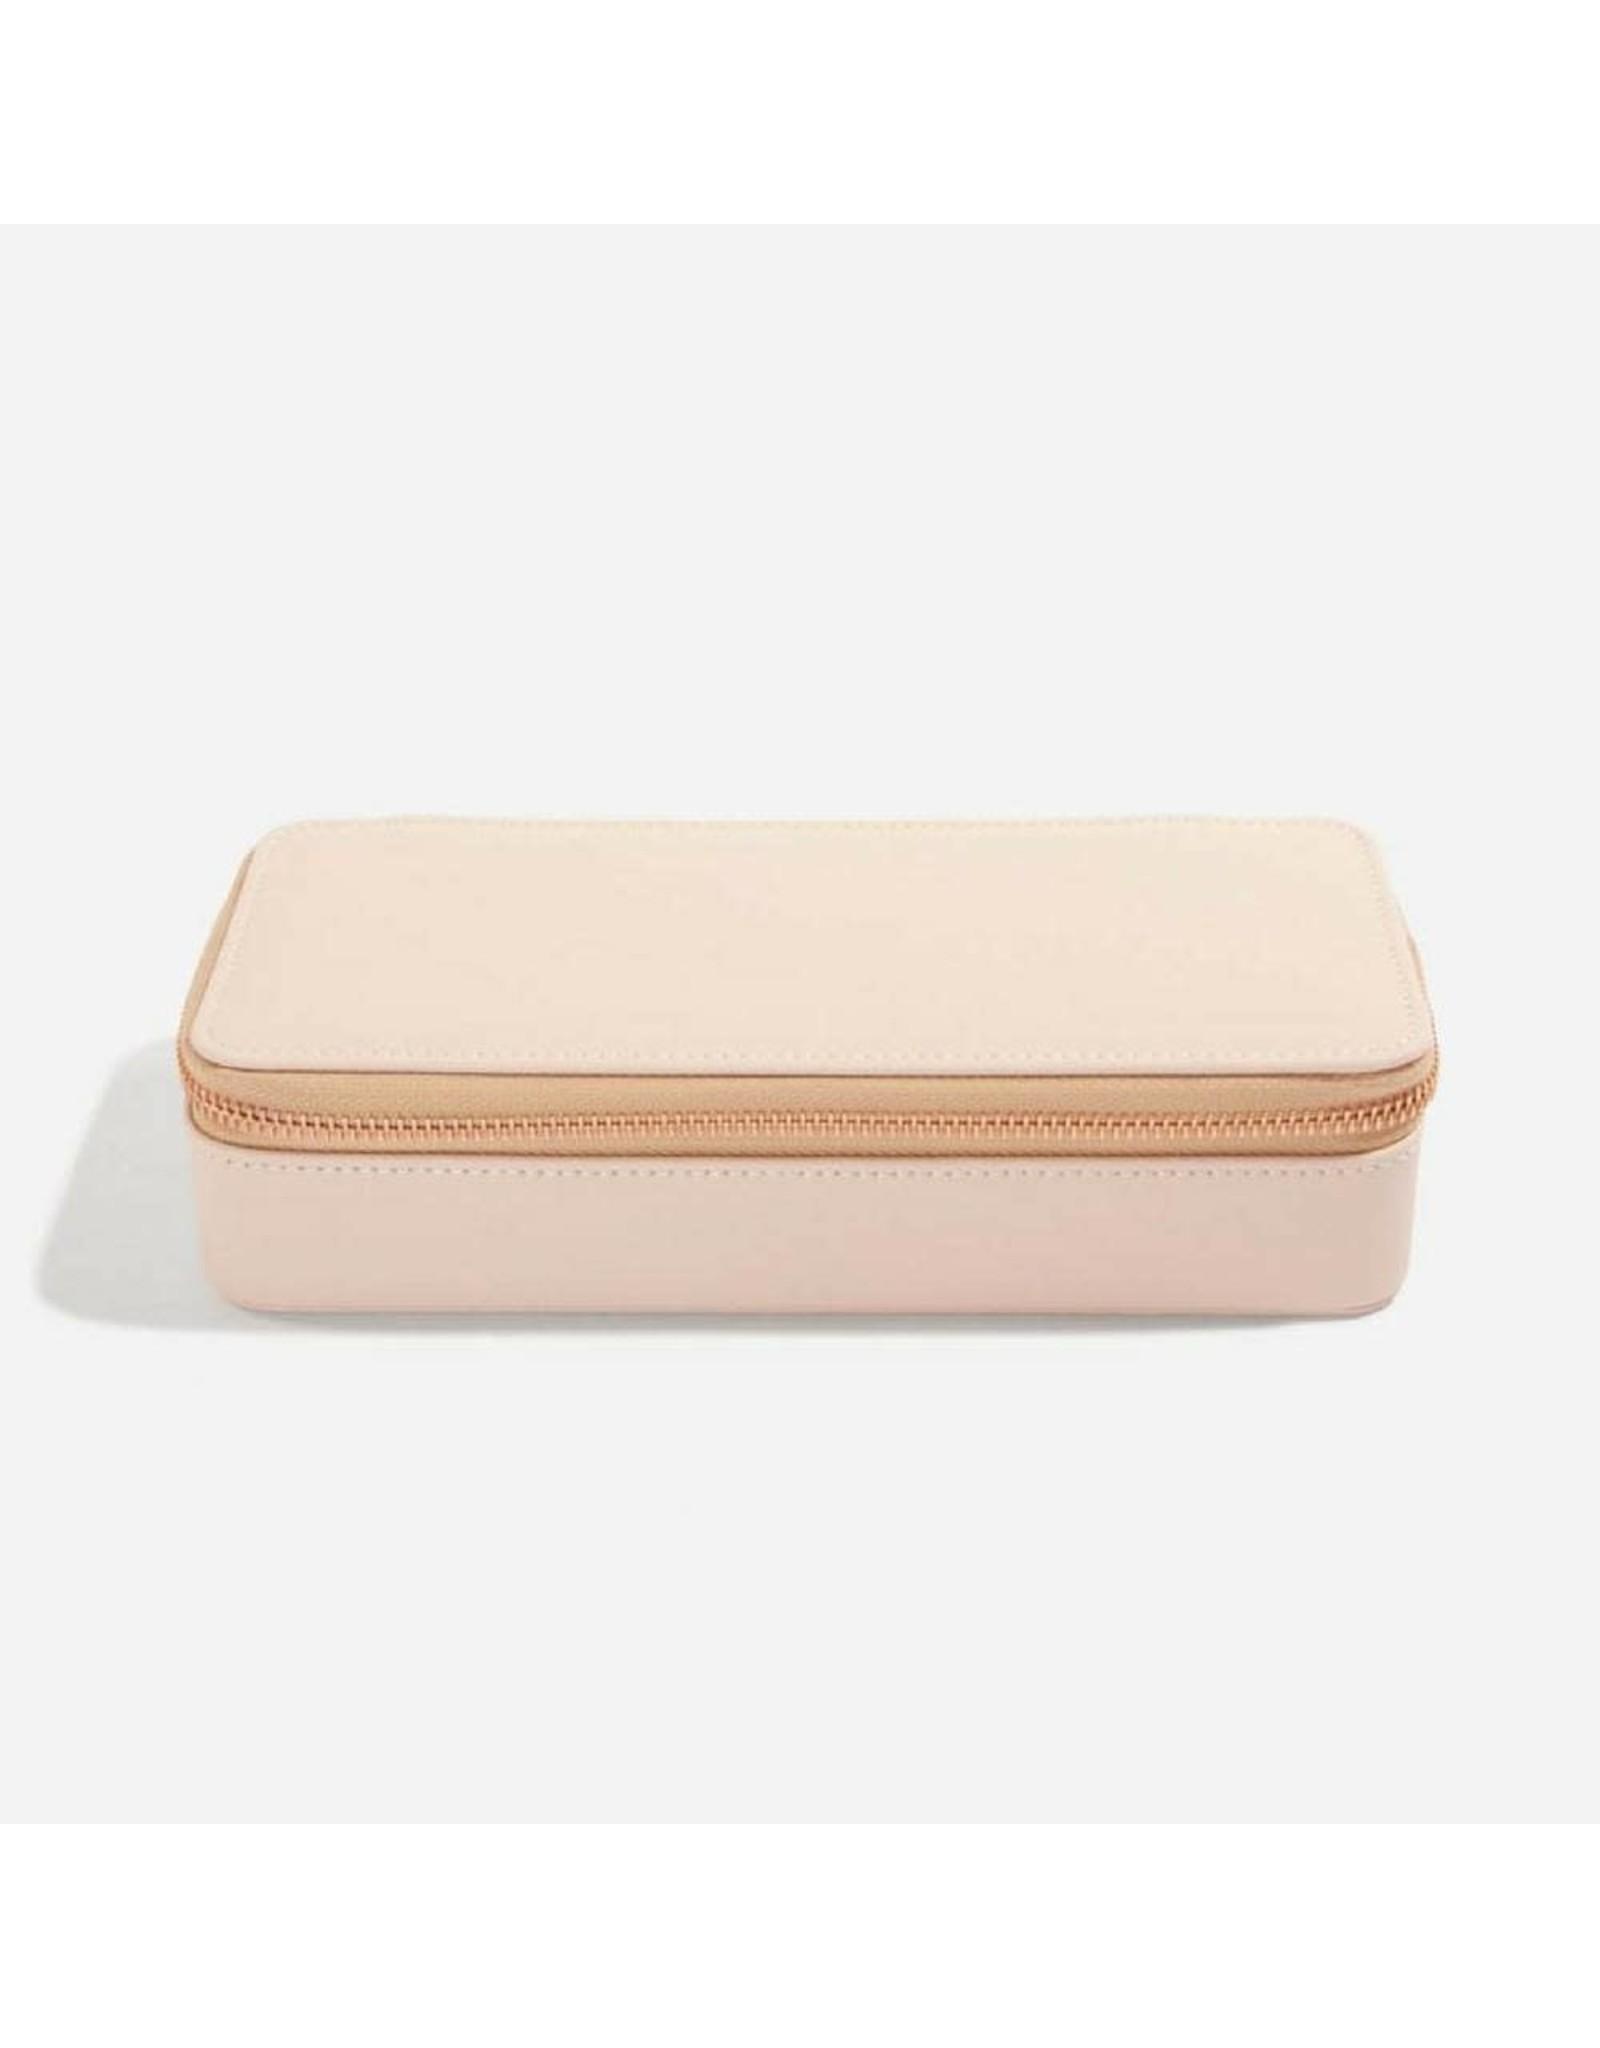 Stackers Blush - Travelbox - Large